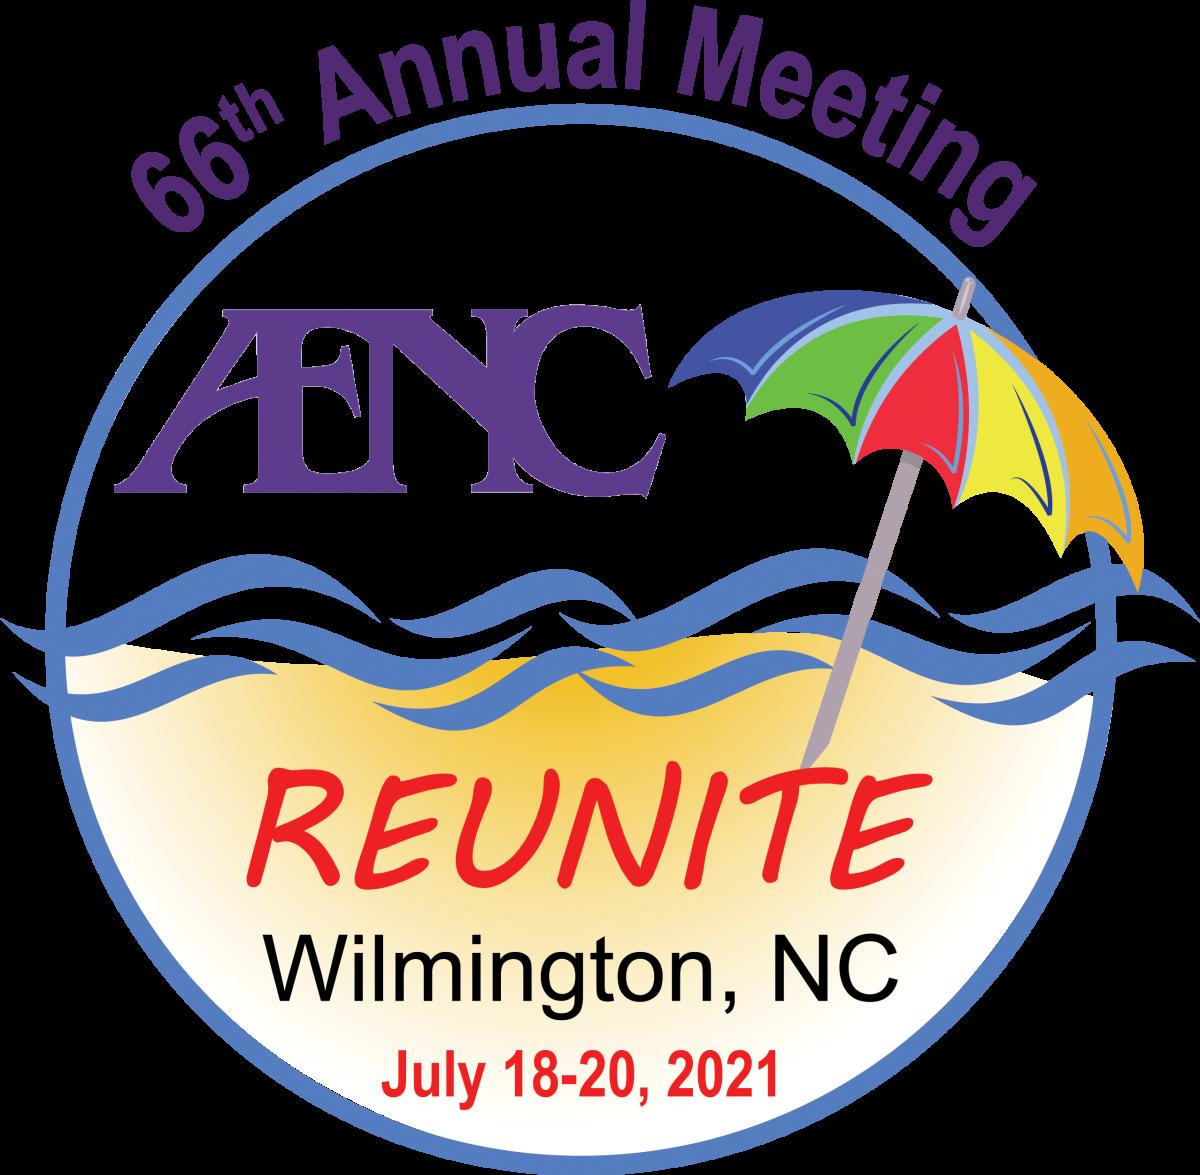 AENC Annual Meeting